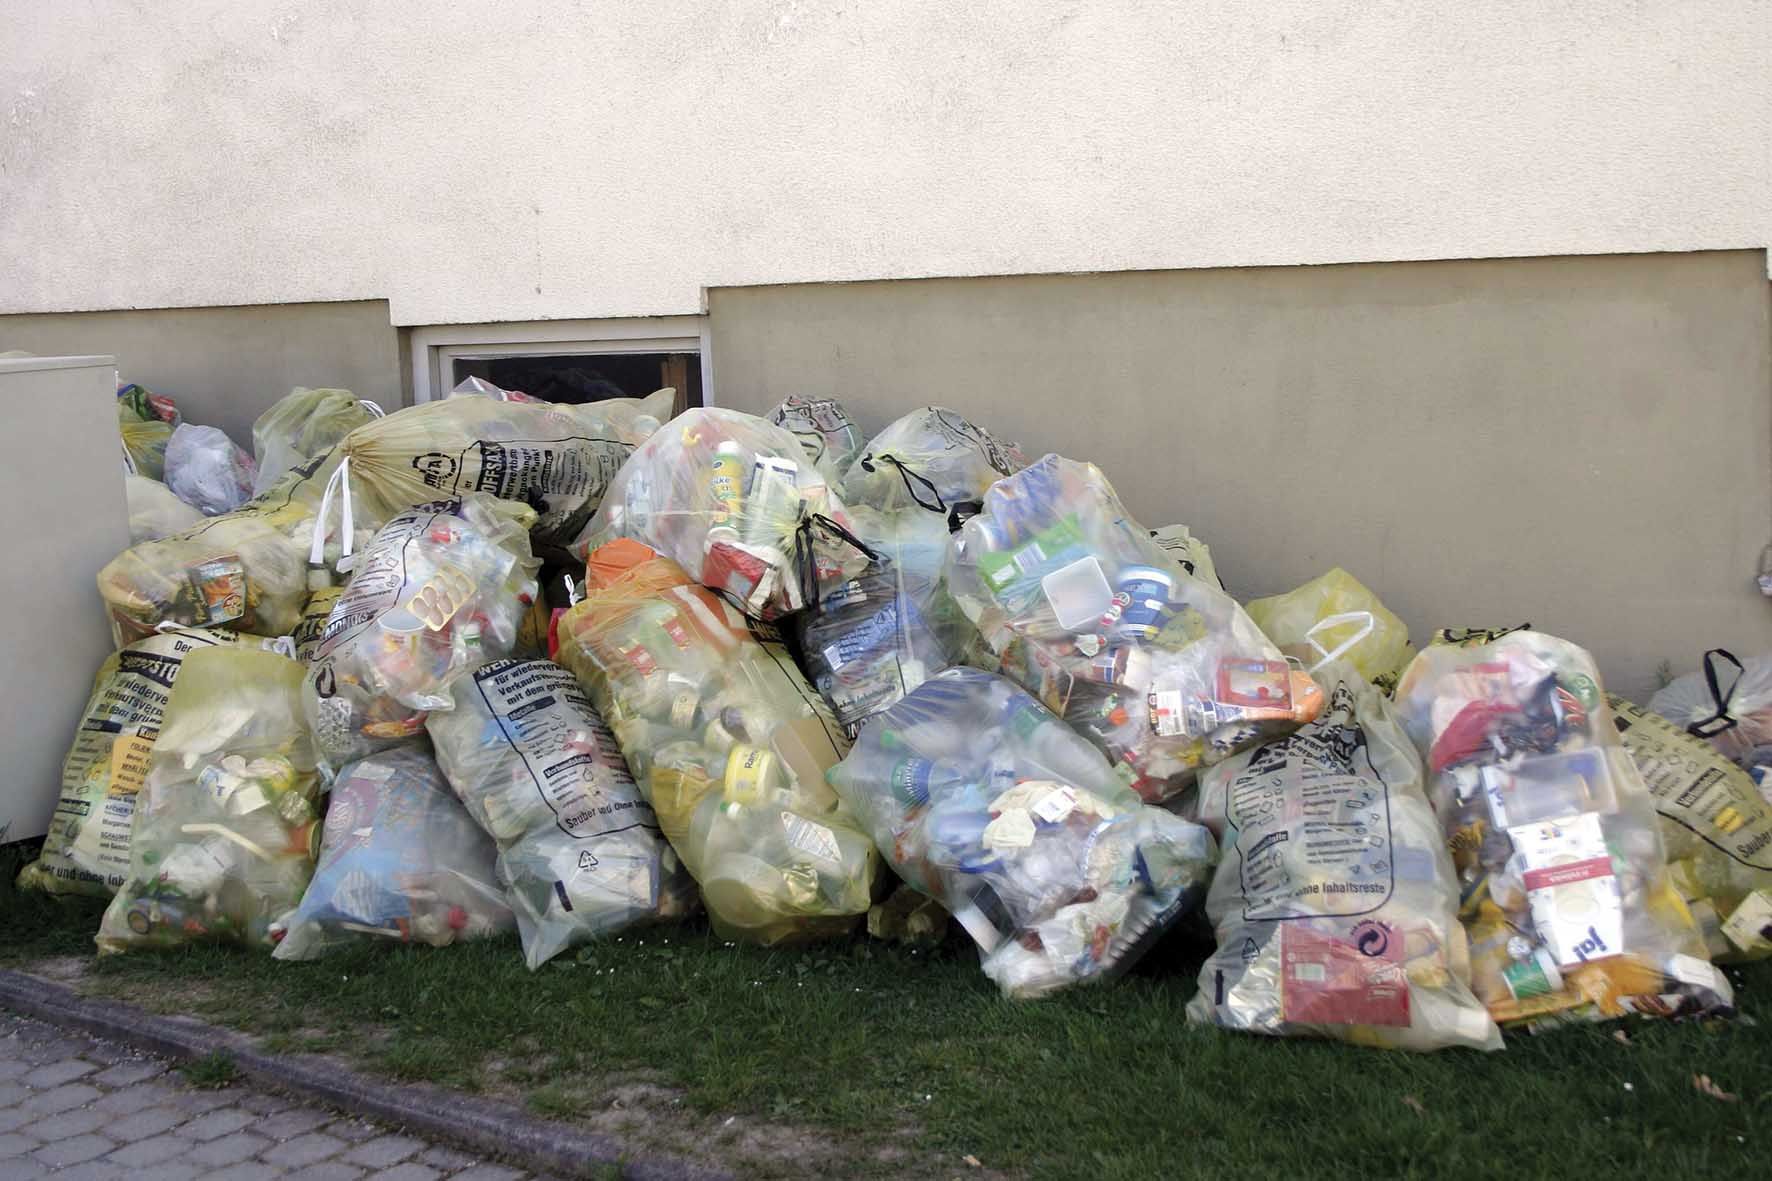 tassa sulla plastica raccolta differenziata rifiuti plastica